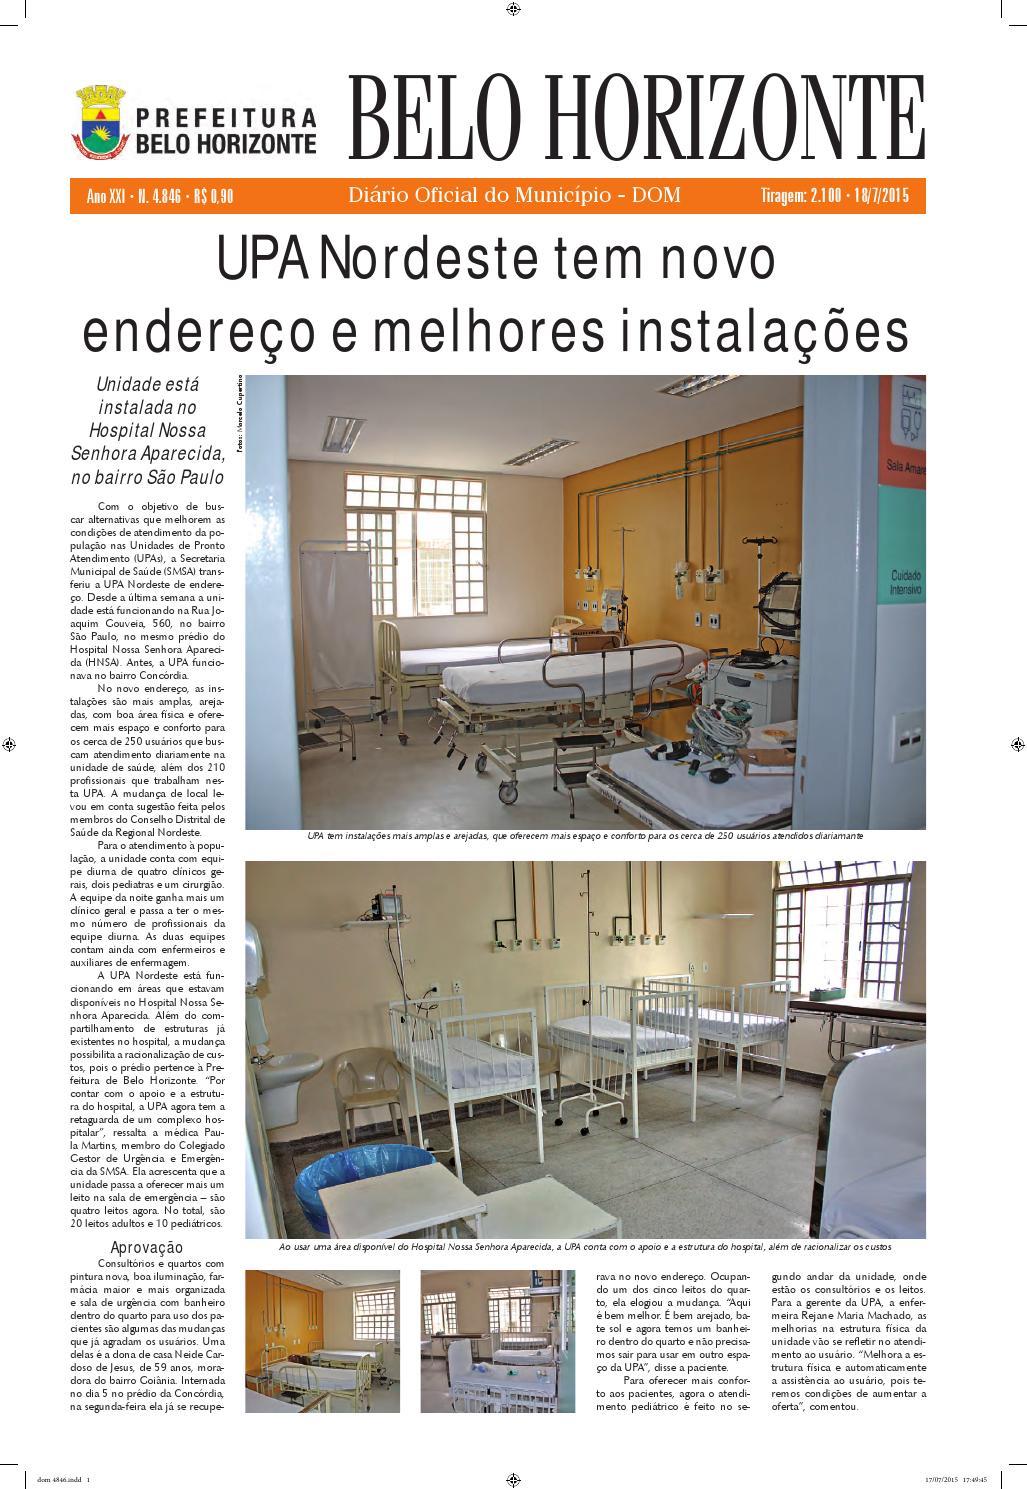 Dom 18 07 2015 By Prefeitura Belo Horizonte Issuu